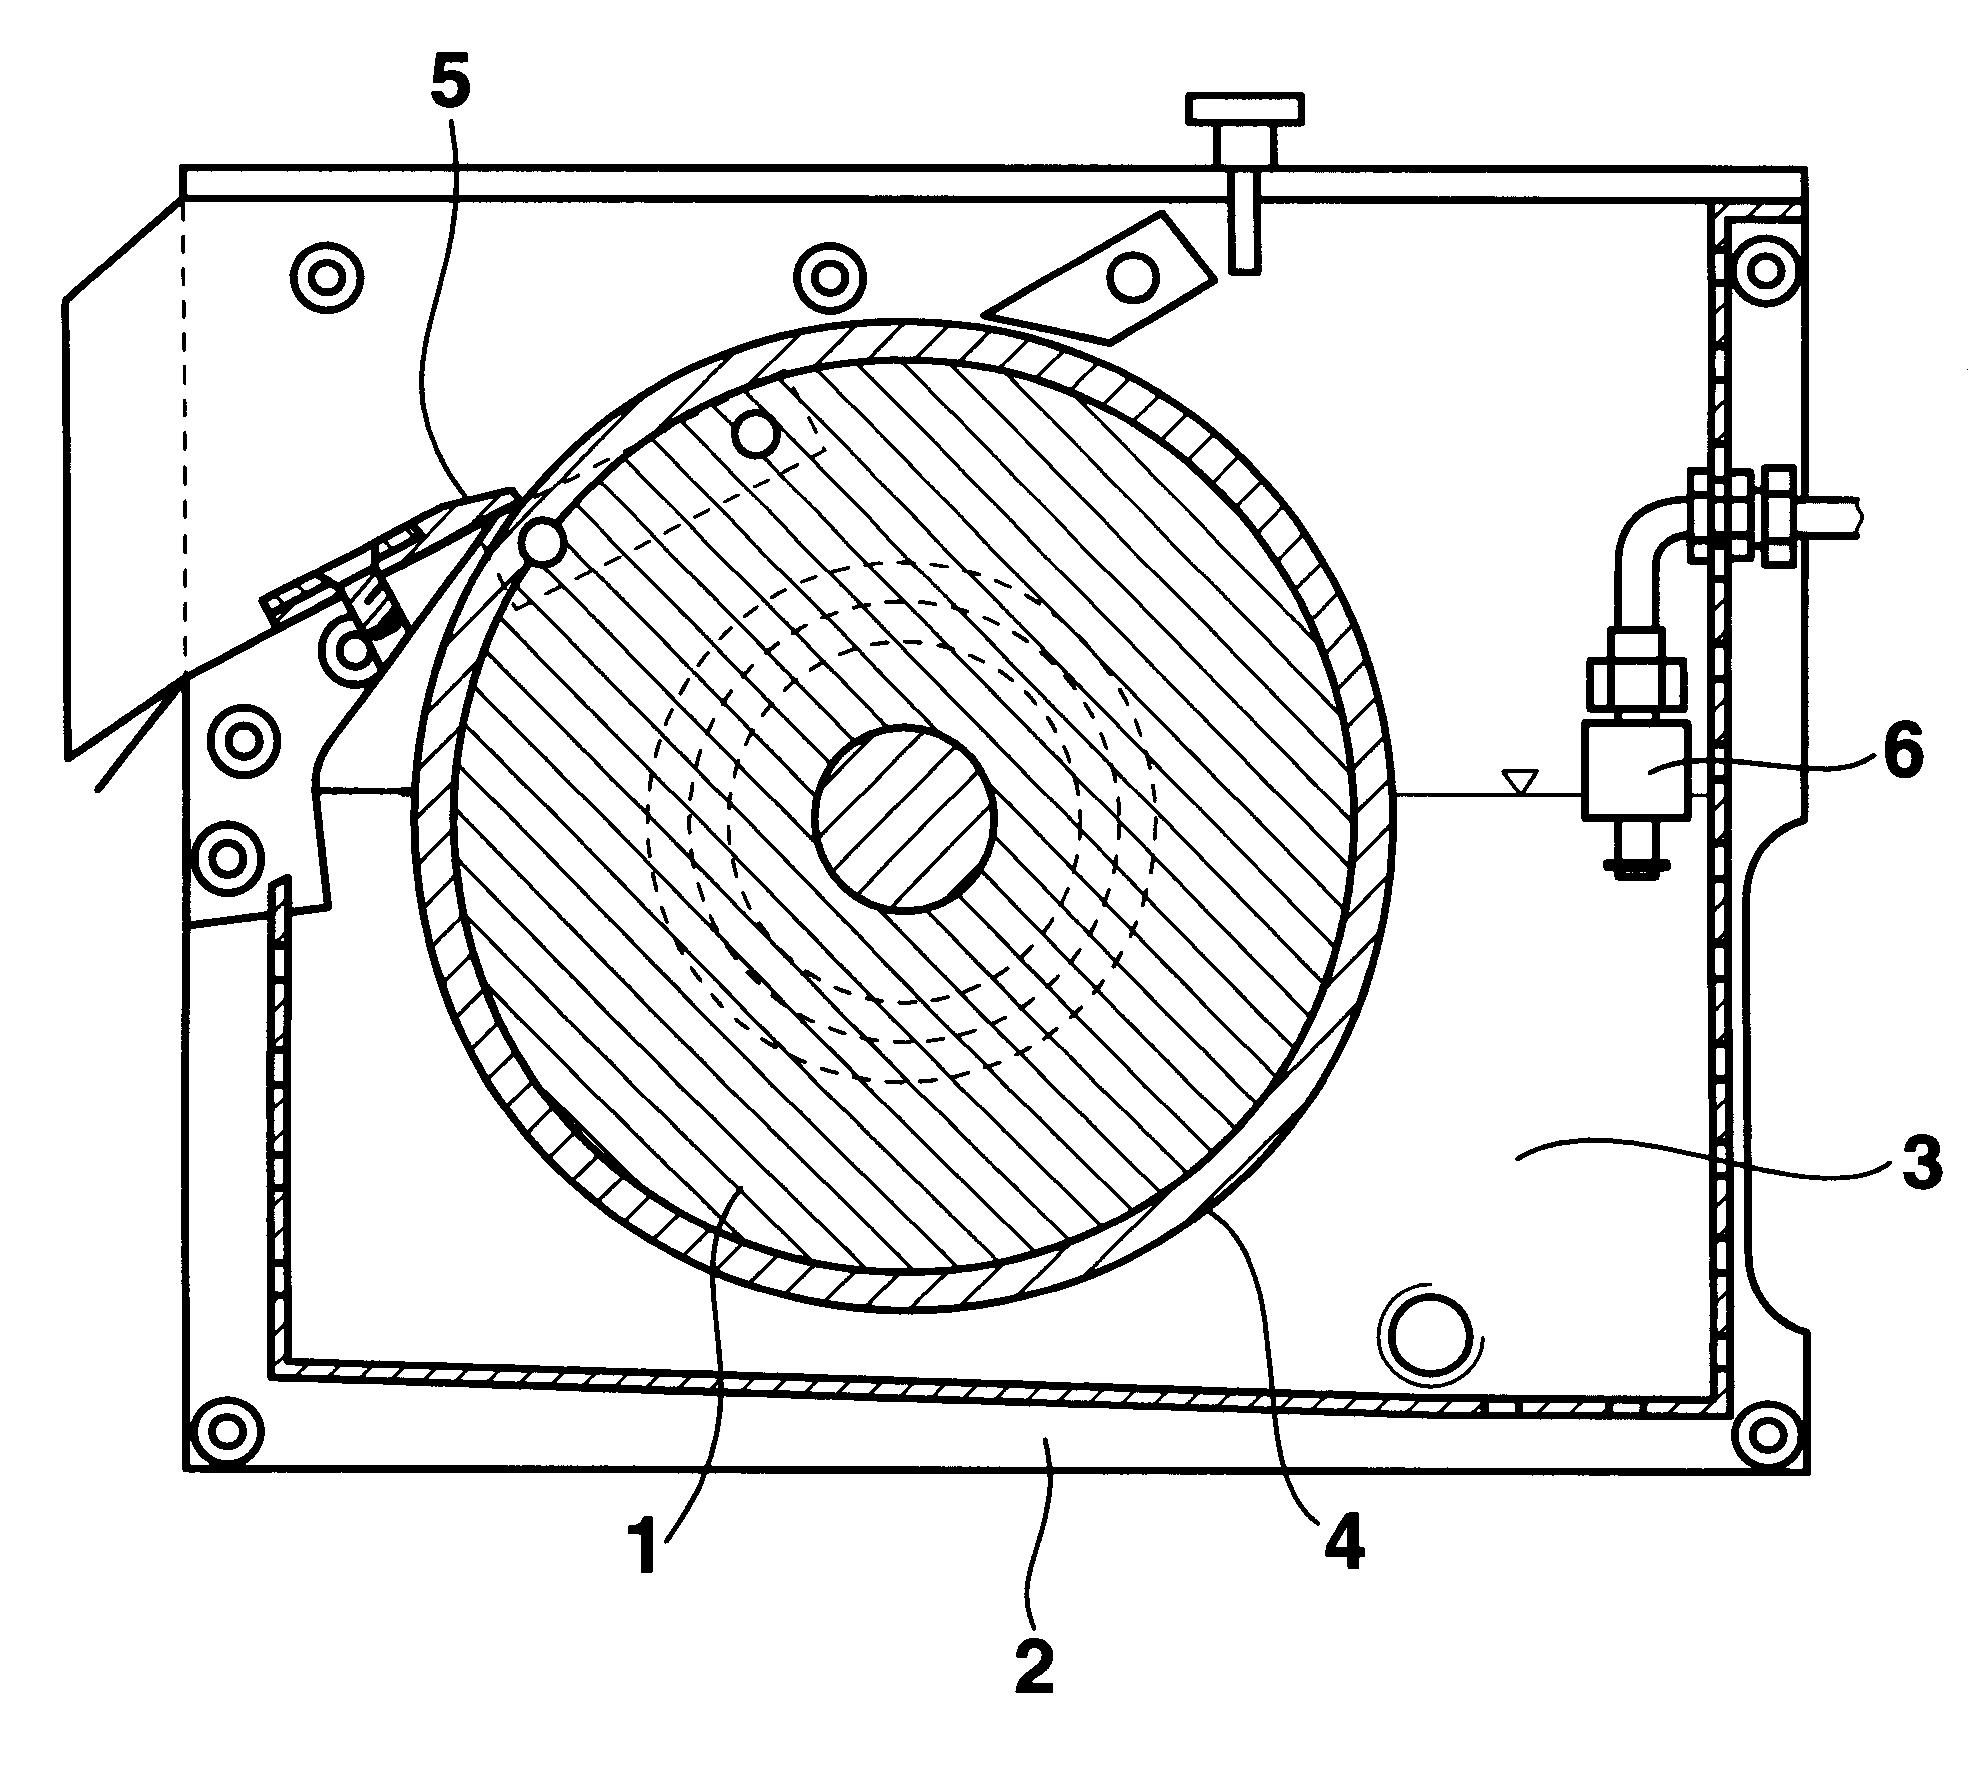 Patent Us6233953 Flake Ice Machine Google Patents Wiring Diagram Drawing